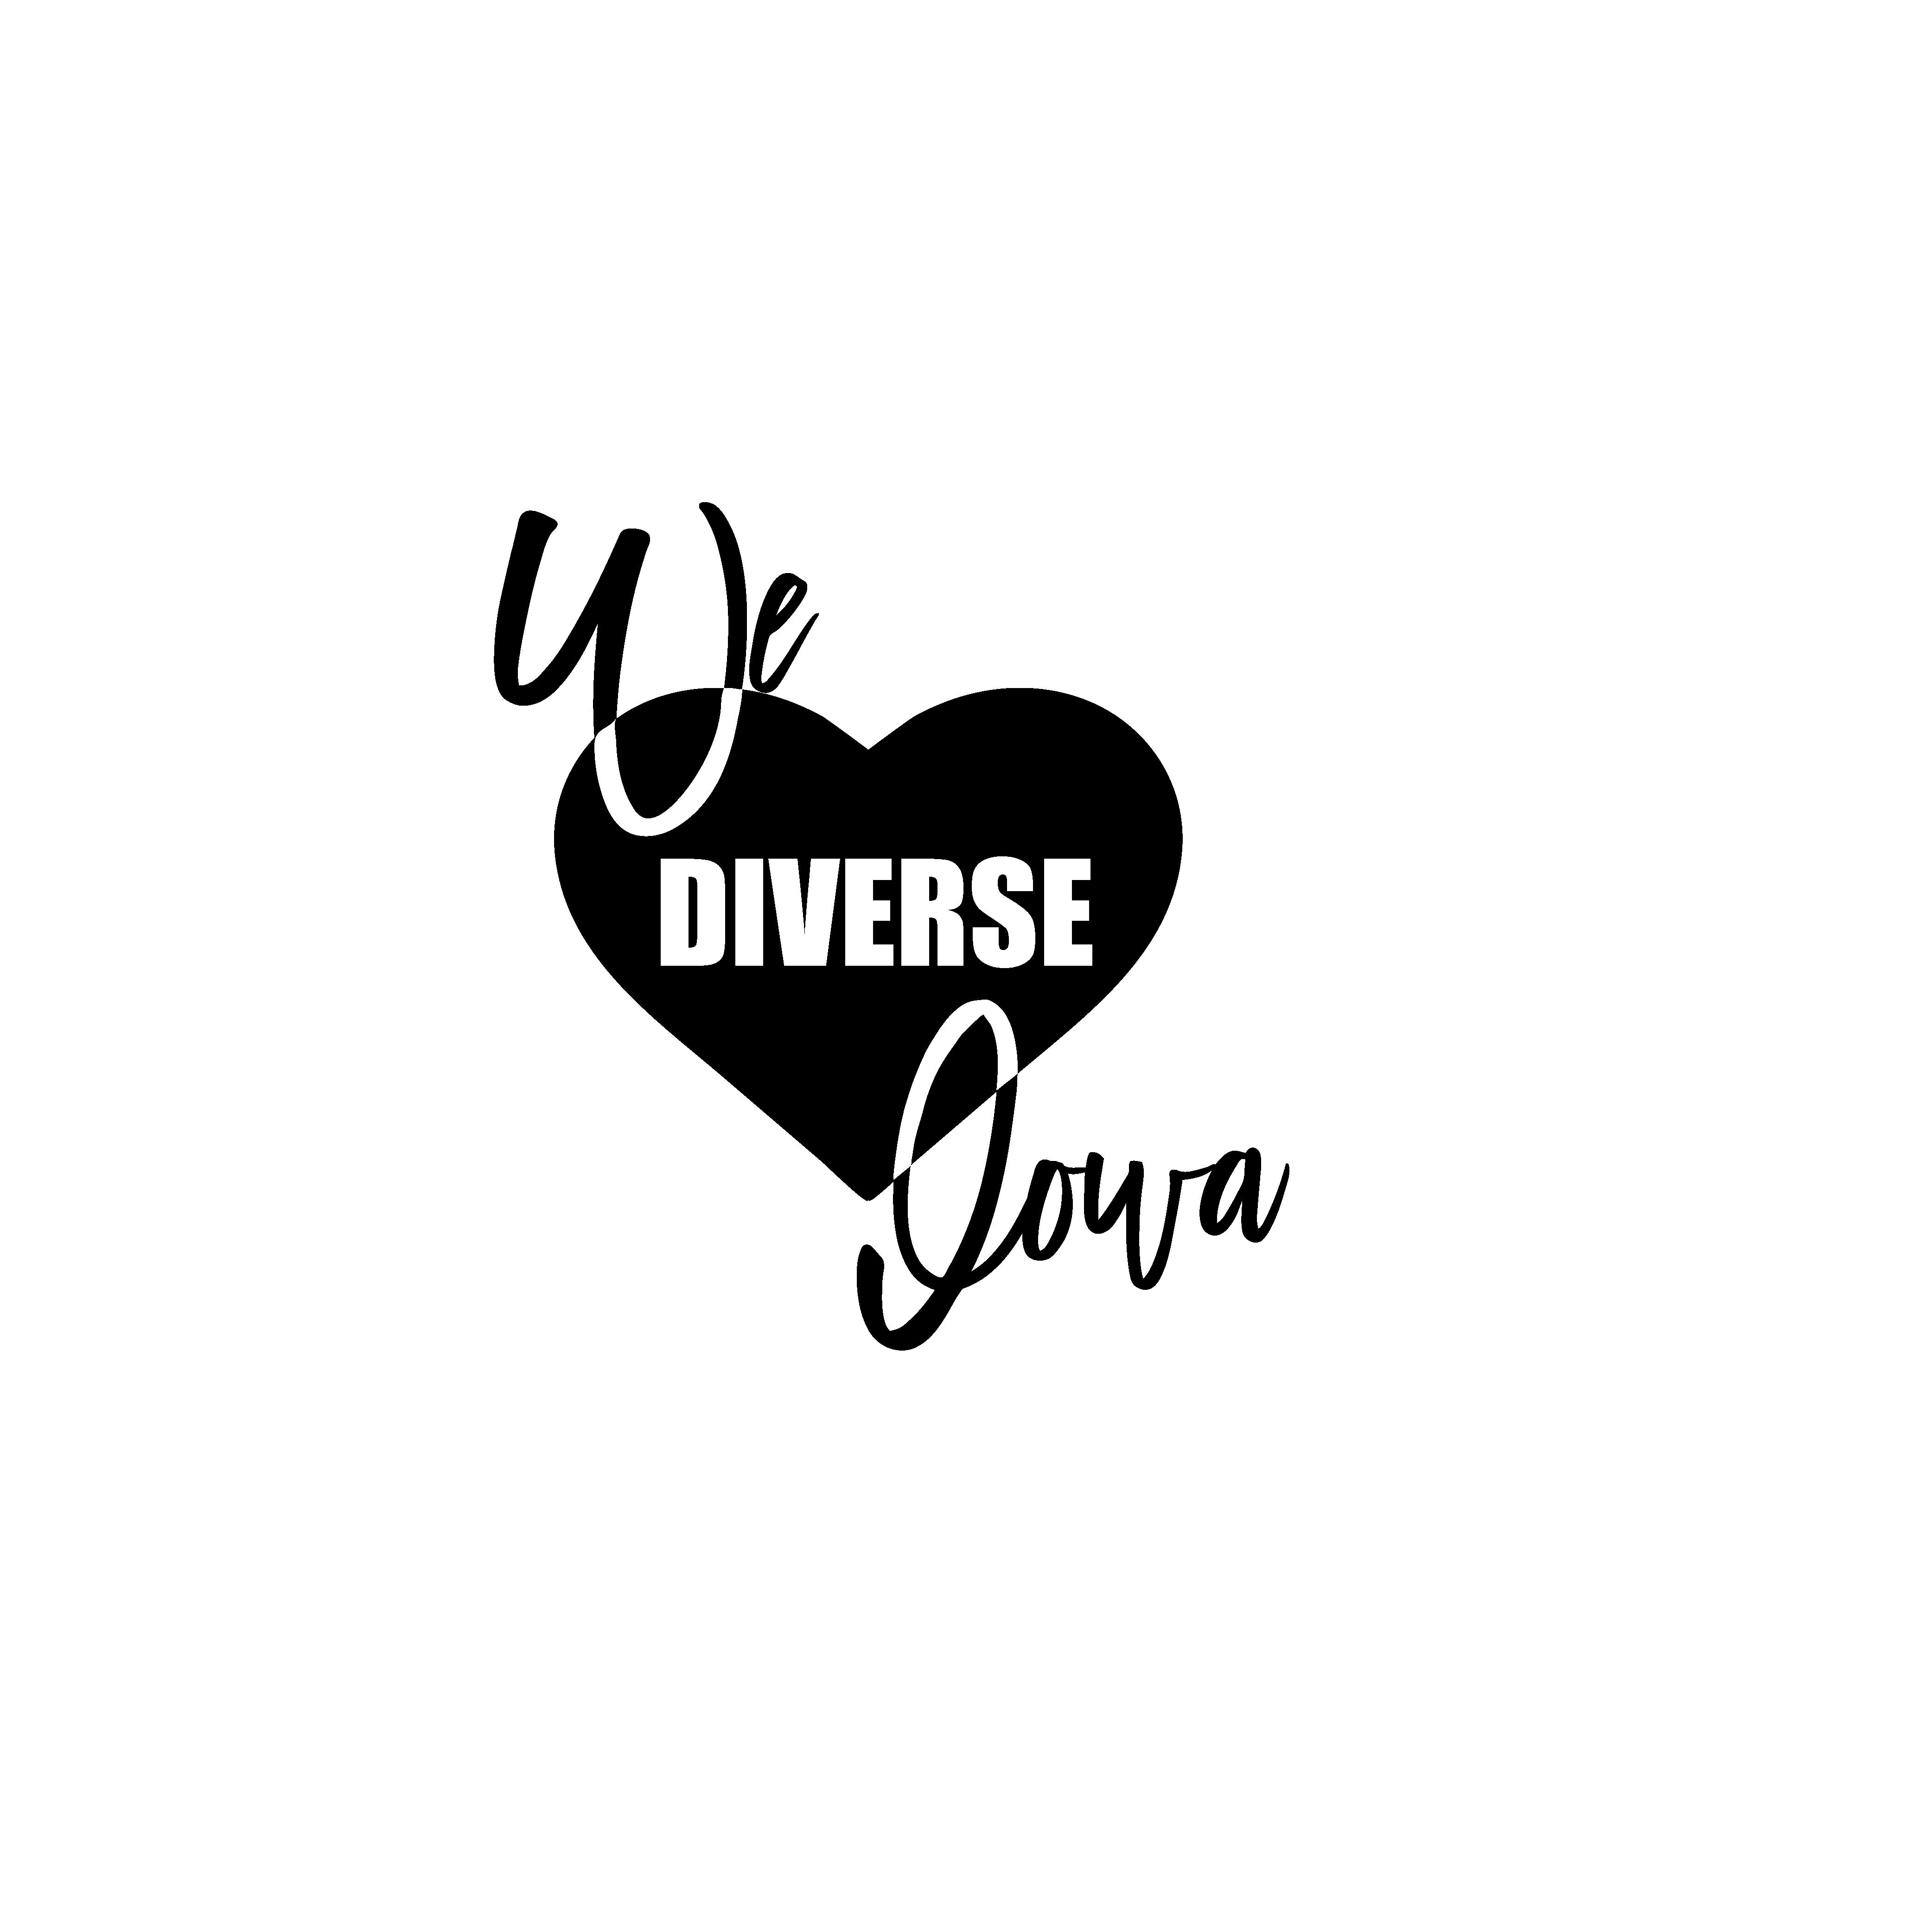 wediverseiowaallcursive-01